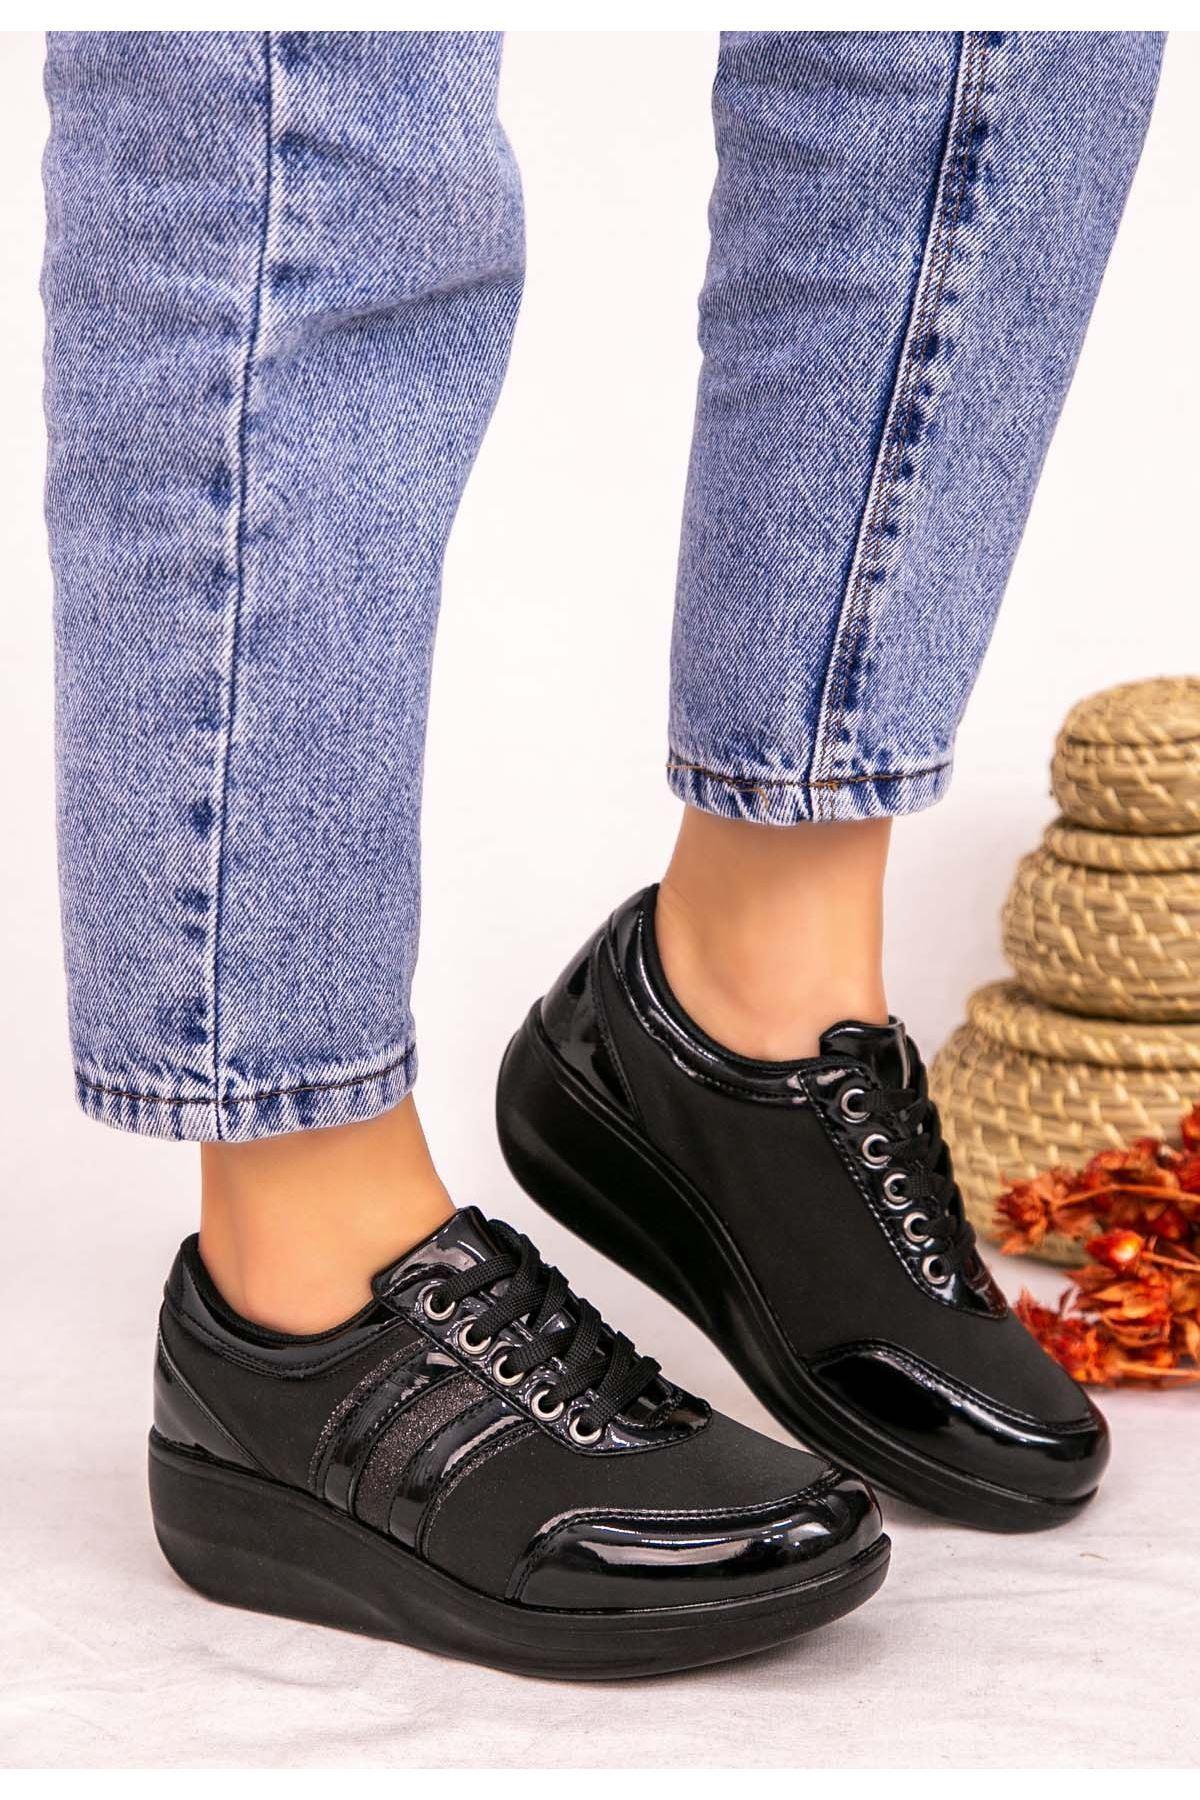 Tinos Siyah Rugan Bağcıklı Spor Ayakkabı